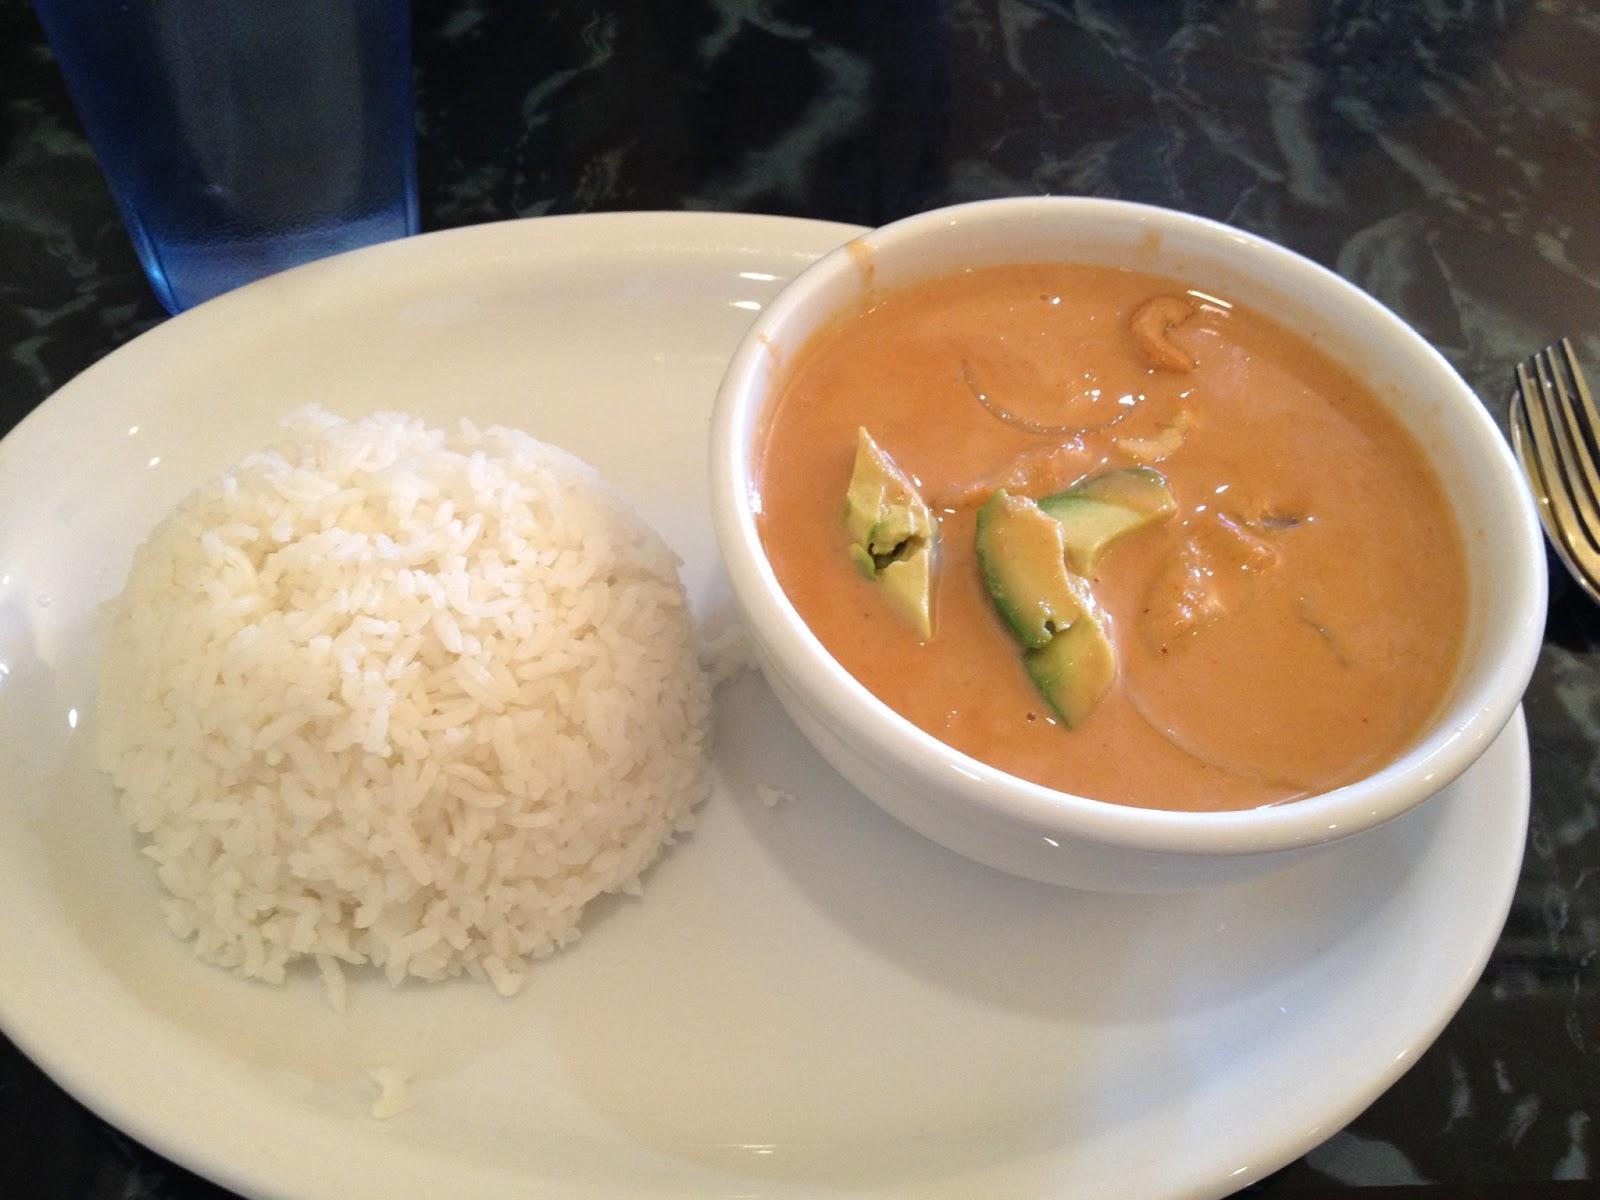 thai food, curry, peanuts, cashews, avocado, pad thai siam, yummy food, restaurant, rice,